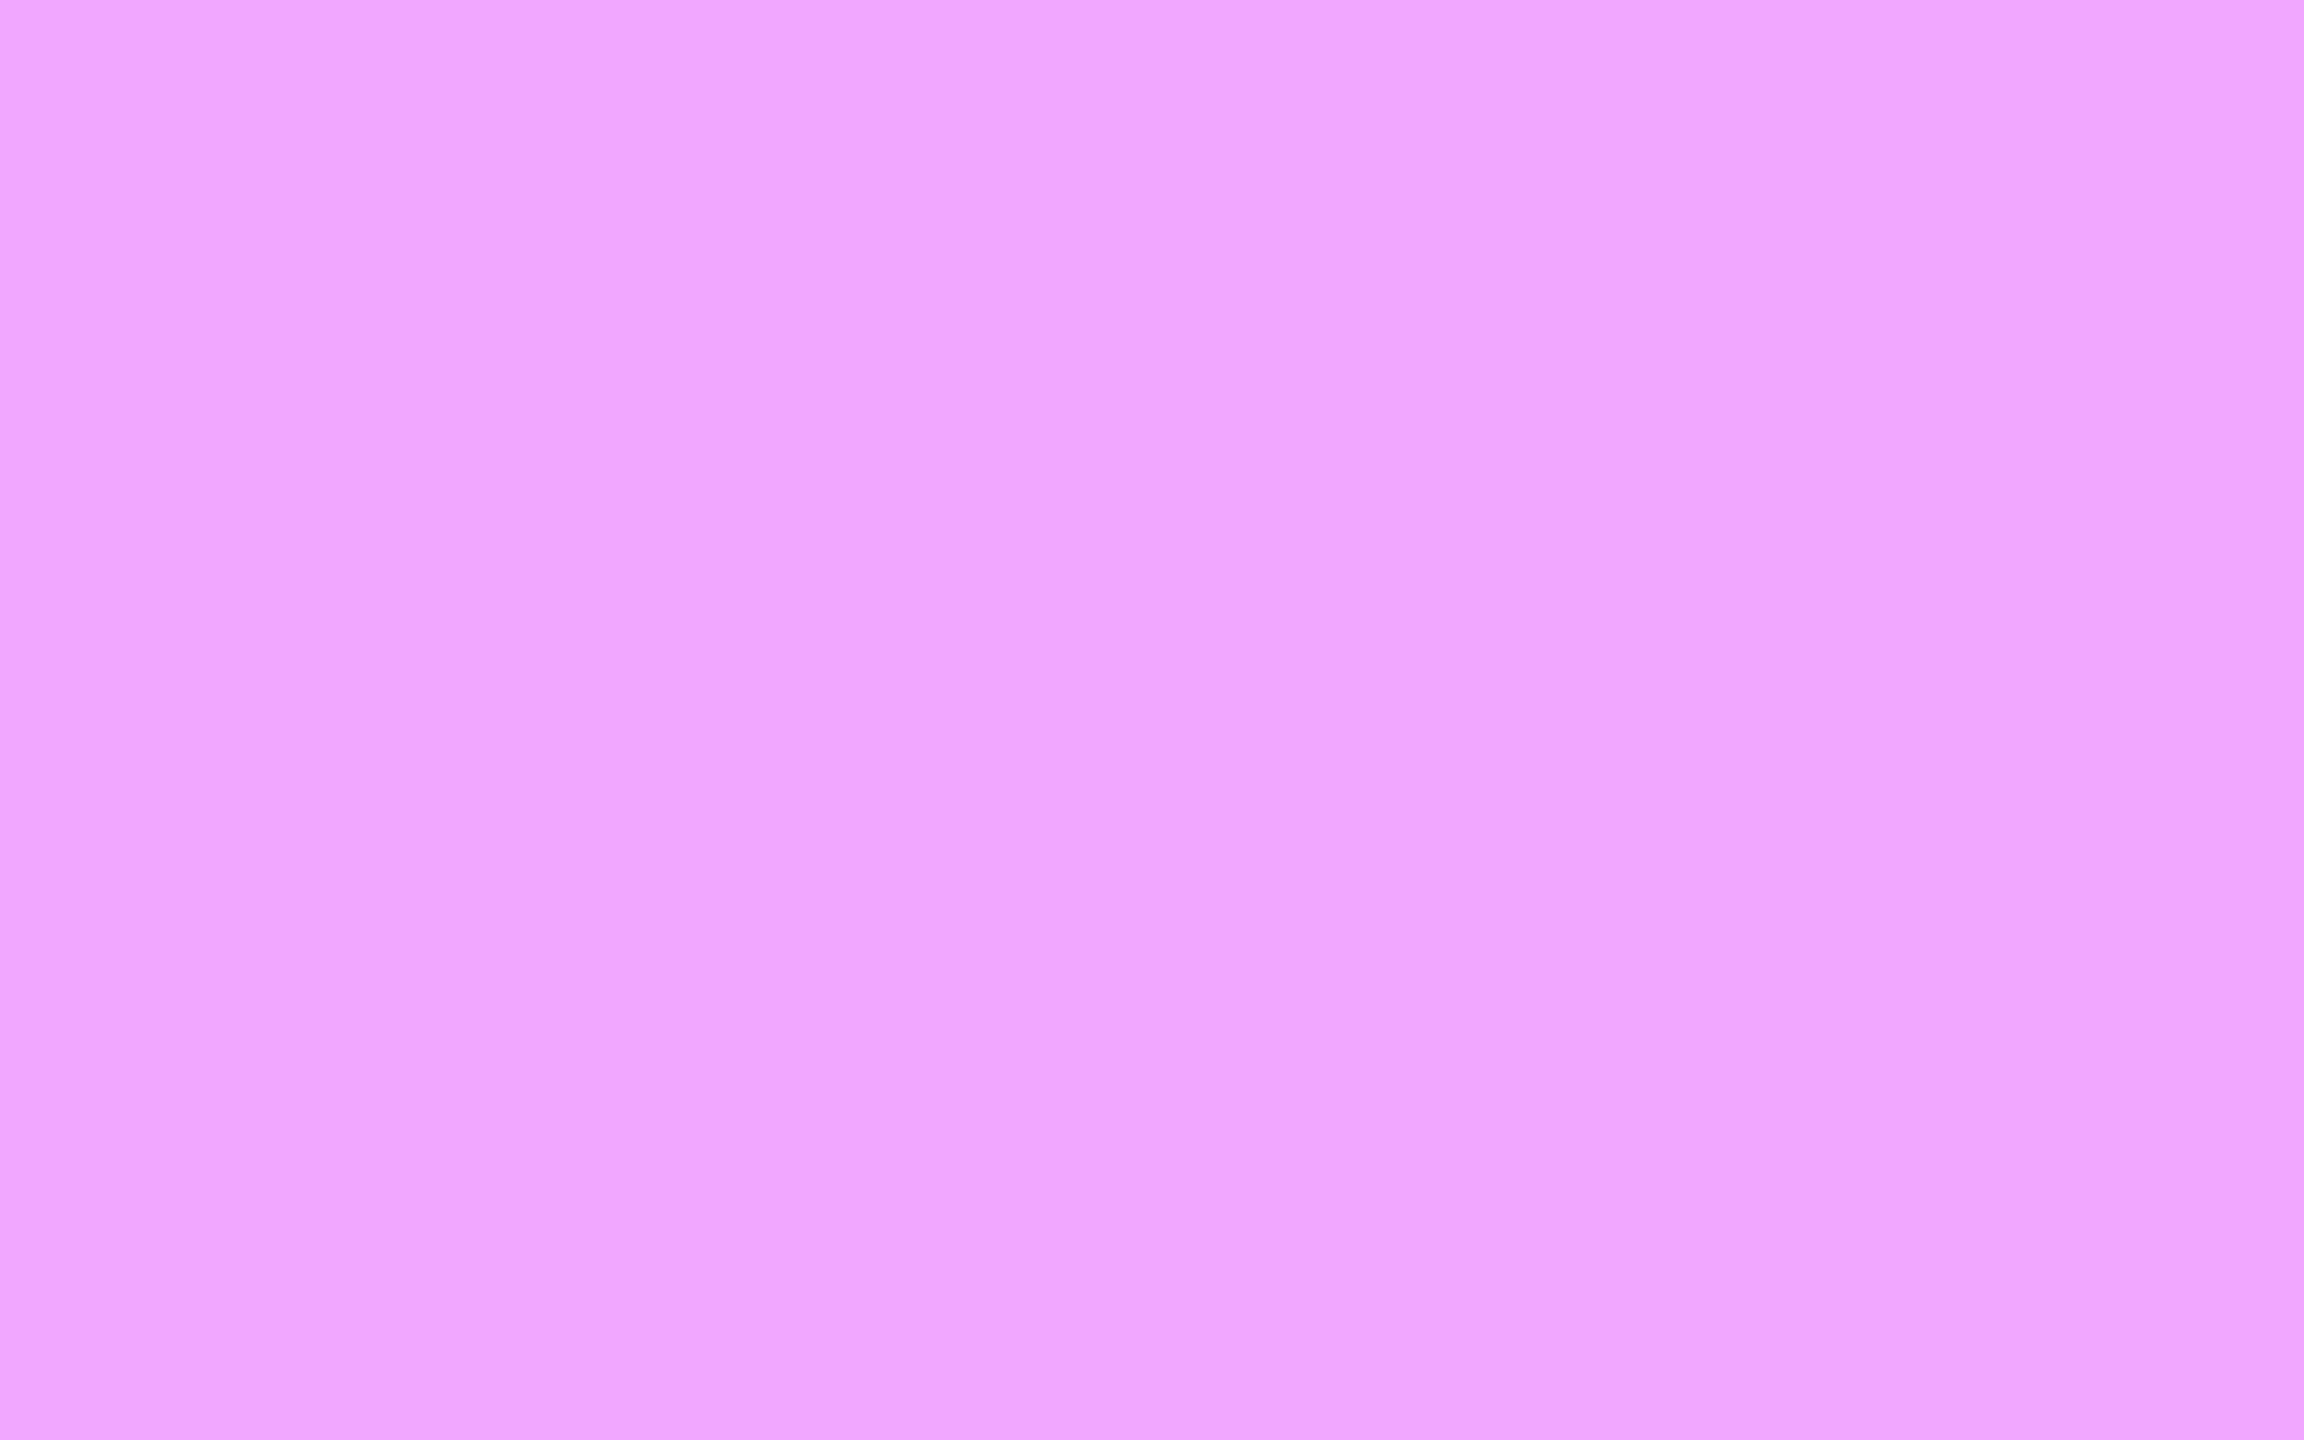 2304x1440 Rich Brilliant Lavender Solid Color Background